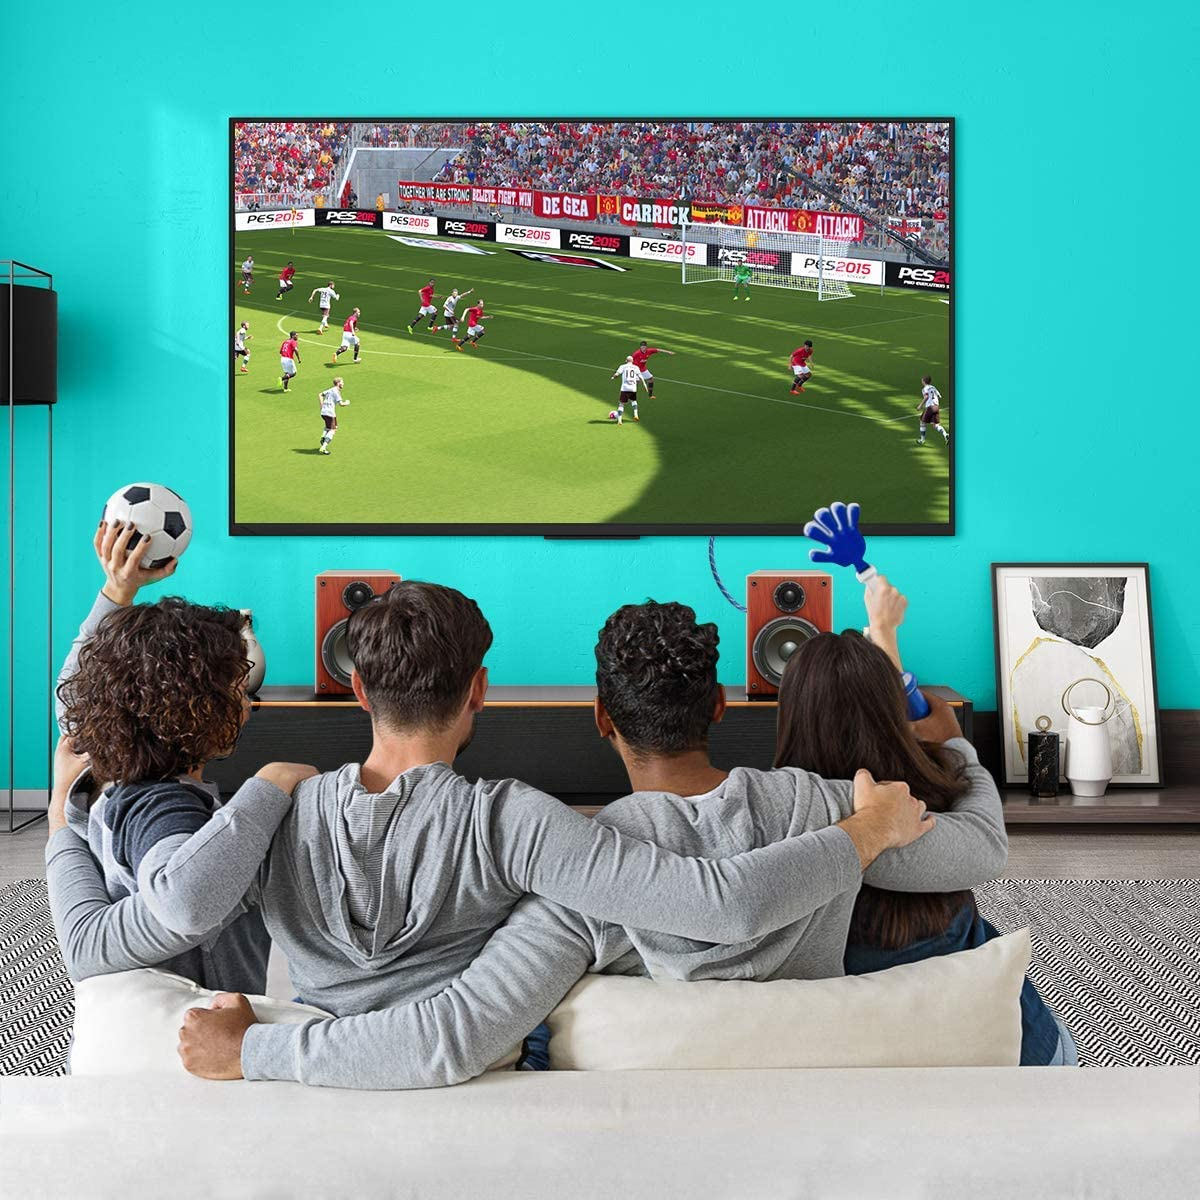 Xbox y m/ás 3M, negro actualizaci/ón HDTV Cable /óptico de /ángulo recto PS3//PS4 Soundbar 90 grados giratorio TOSLINK enchufe cable de fibra /óptica para reproductor Blu-Ray EMK